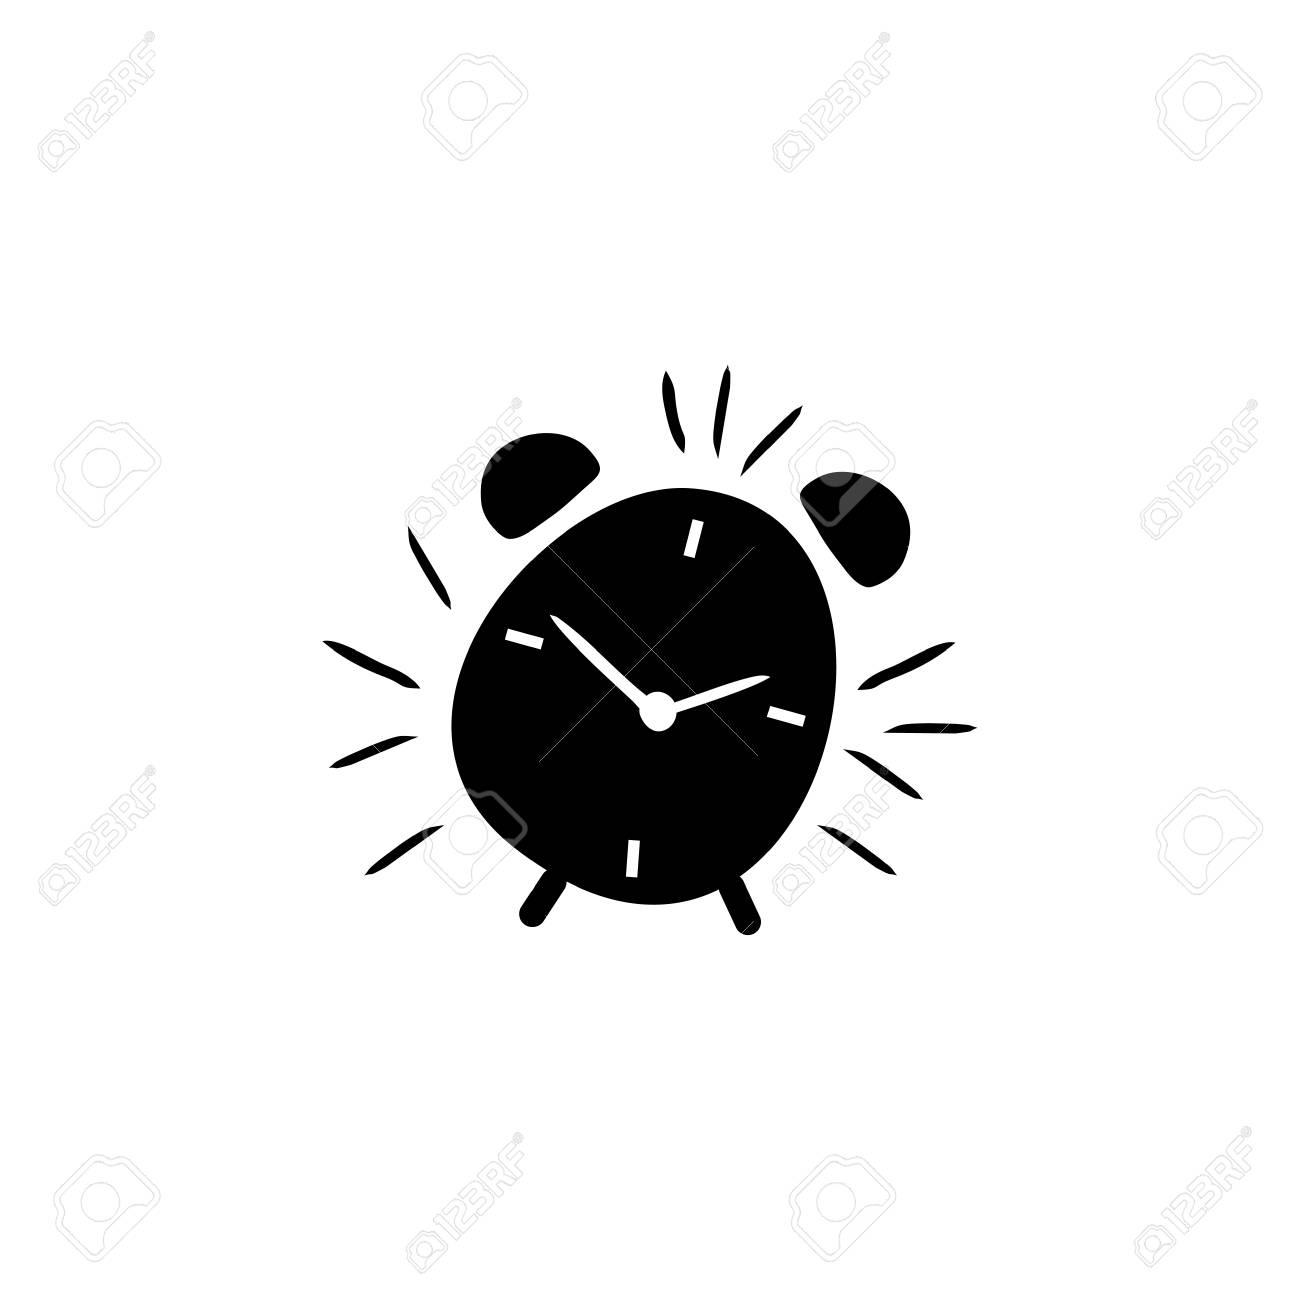 Alarm clock hand drawn outline vector icon - 110105561